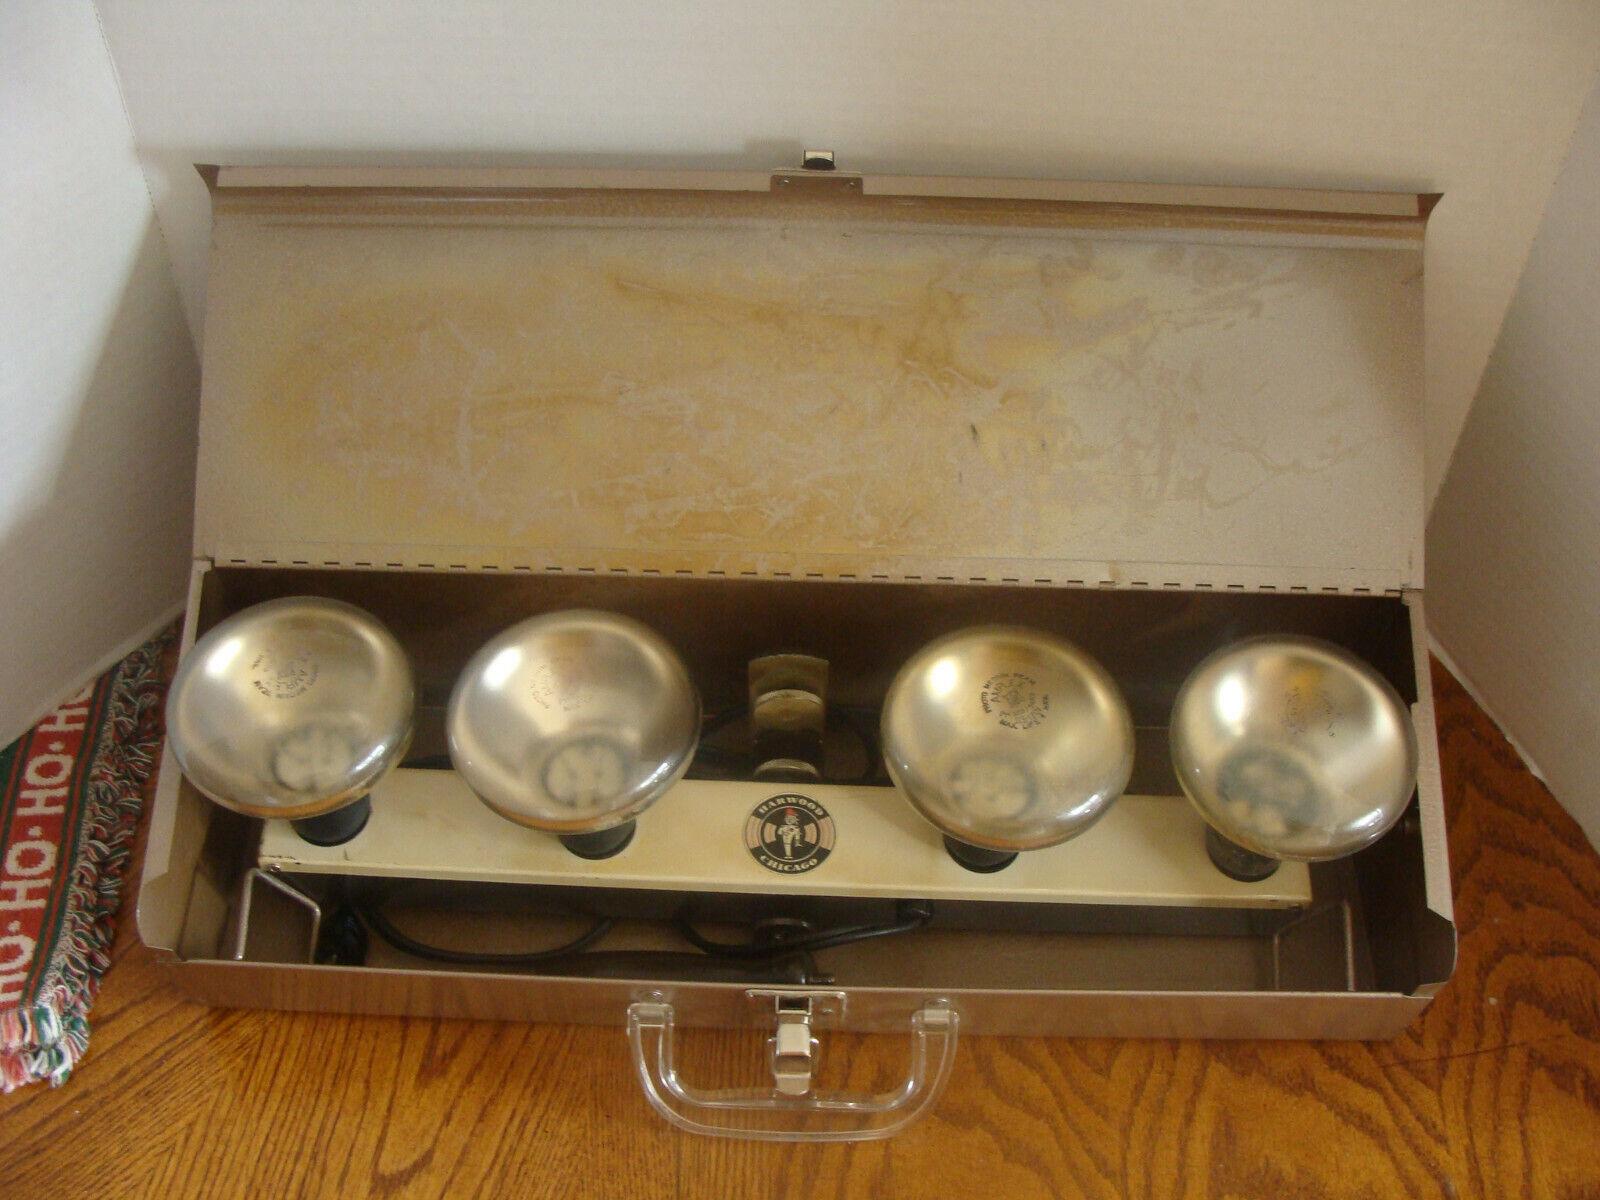 VTG Harwood Chicago 4 Light Movie Photography Light Bar W/Metal Carrying Case  - $5.00